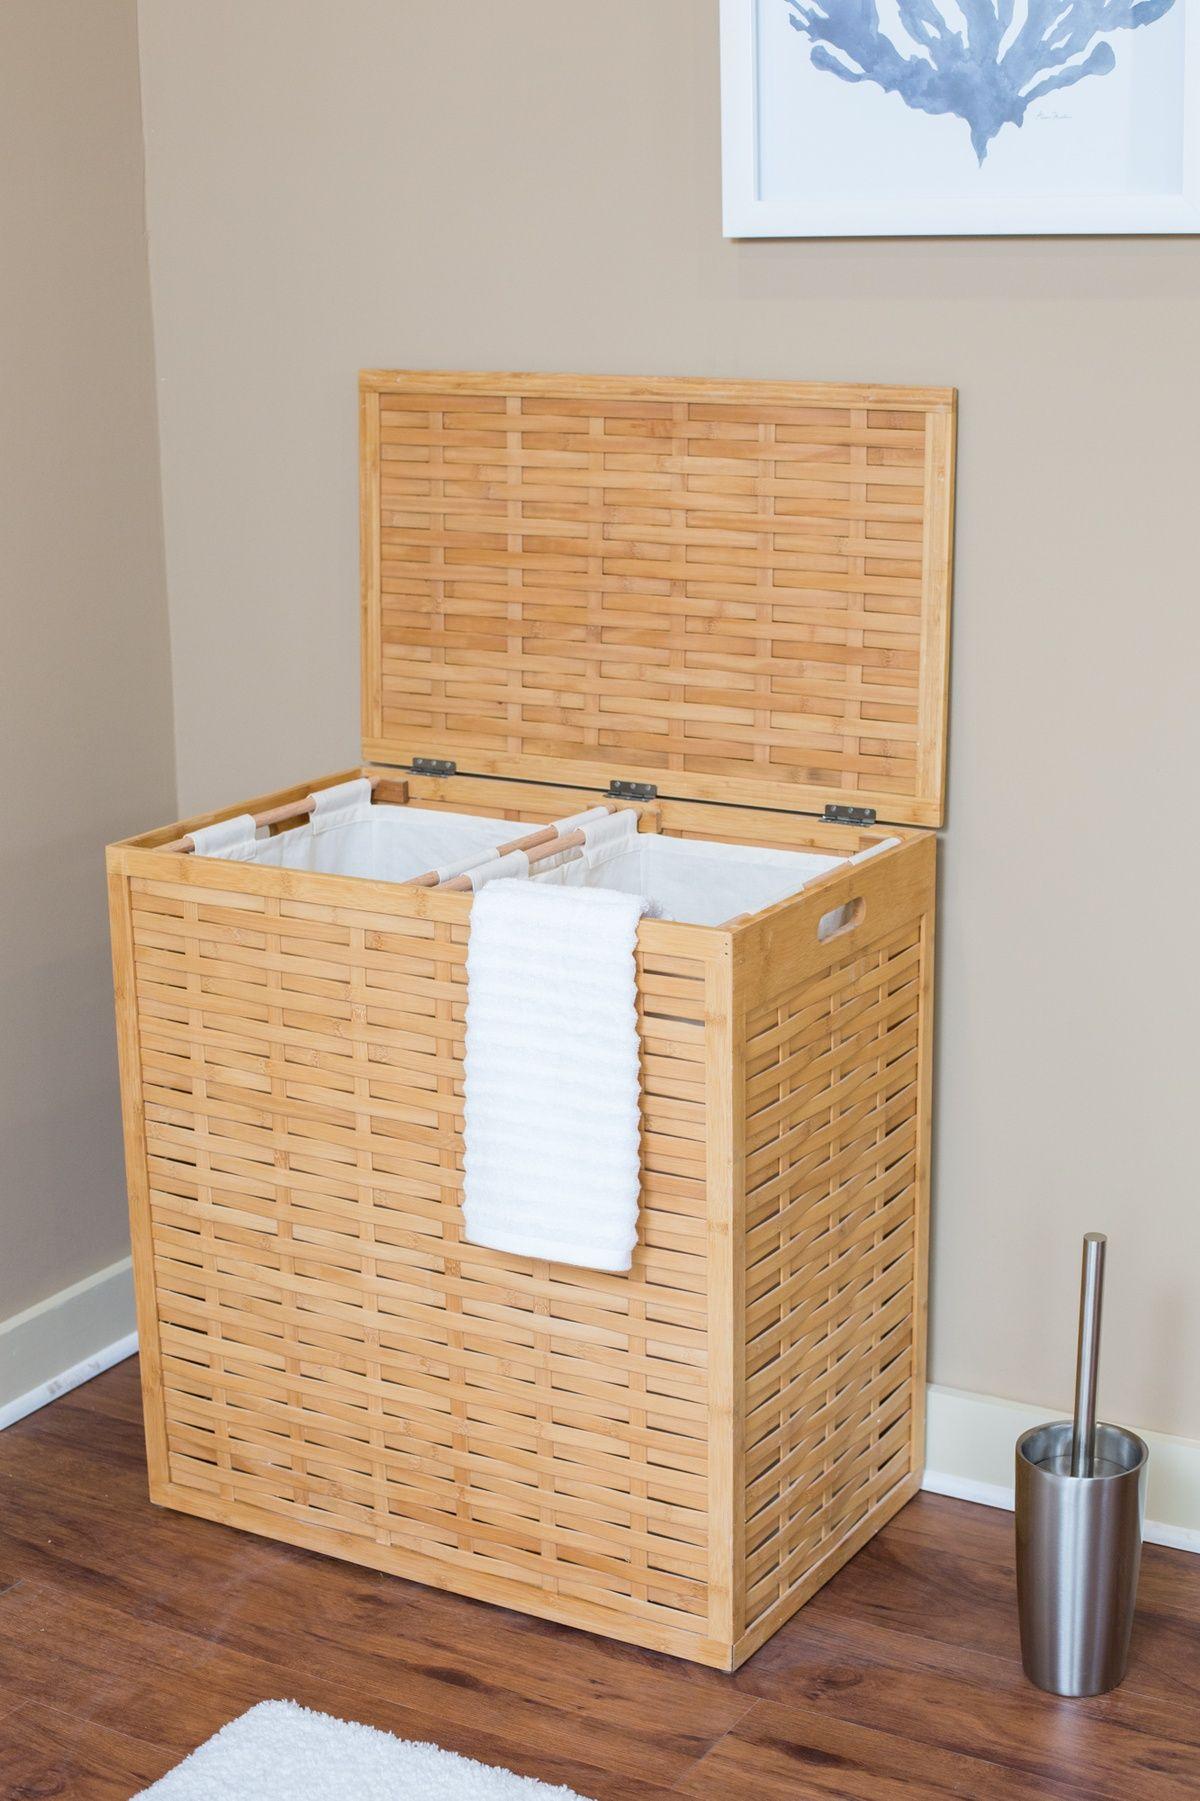 Oversized Bamboo Divided Laundry Hamper En 2020 Cosas Lindas